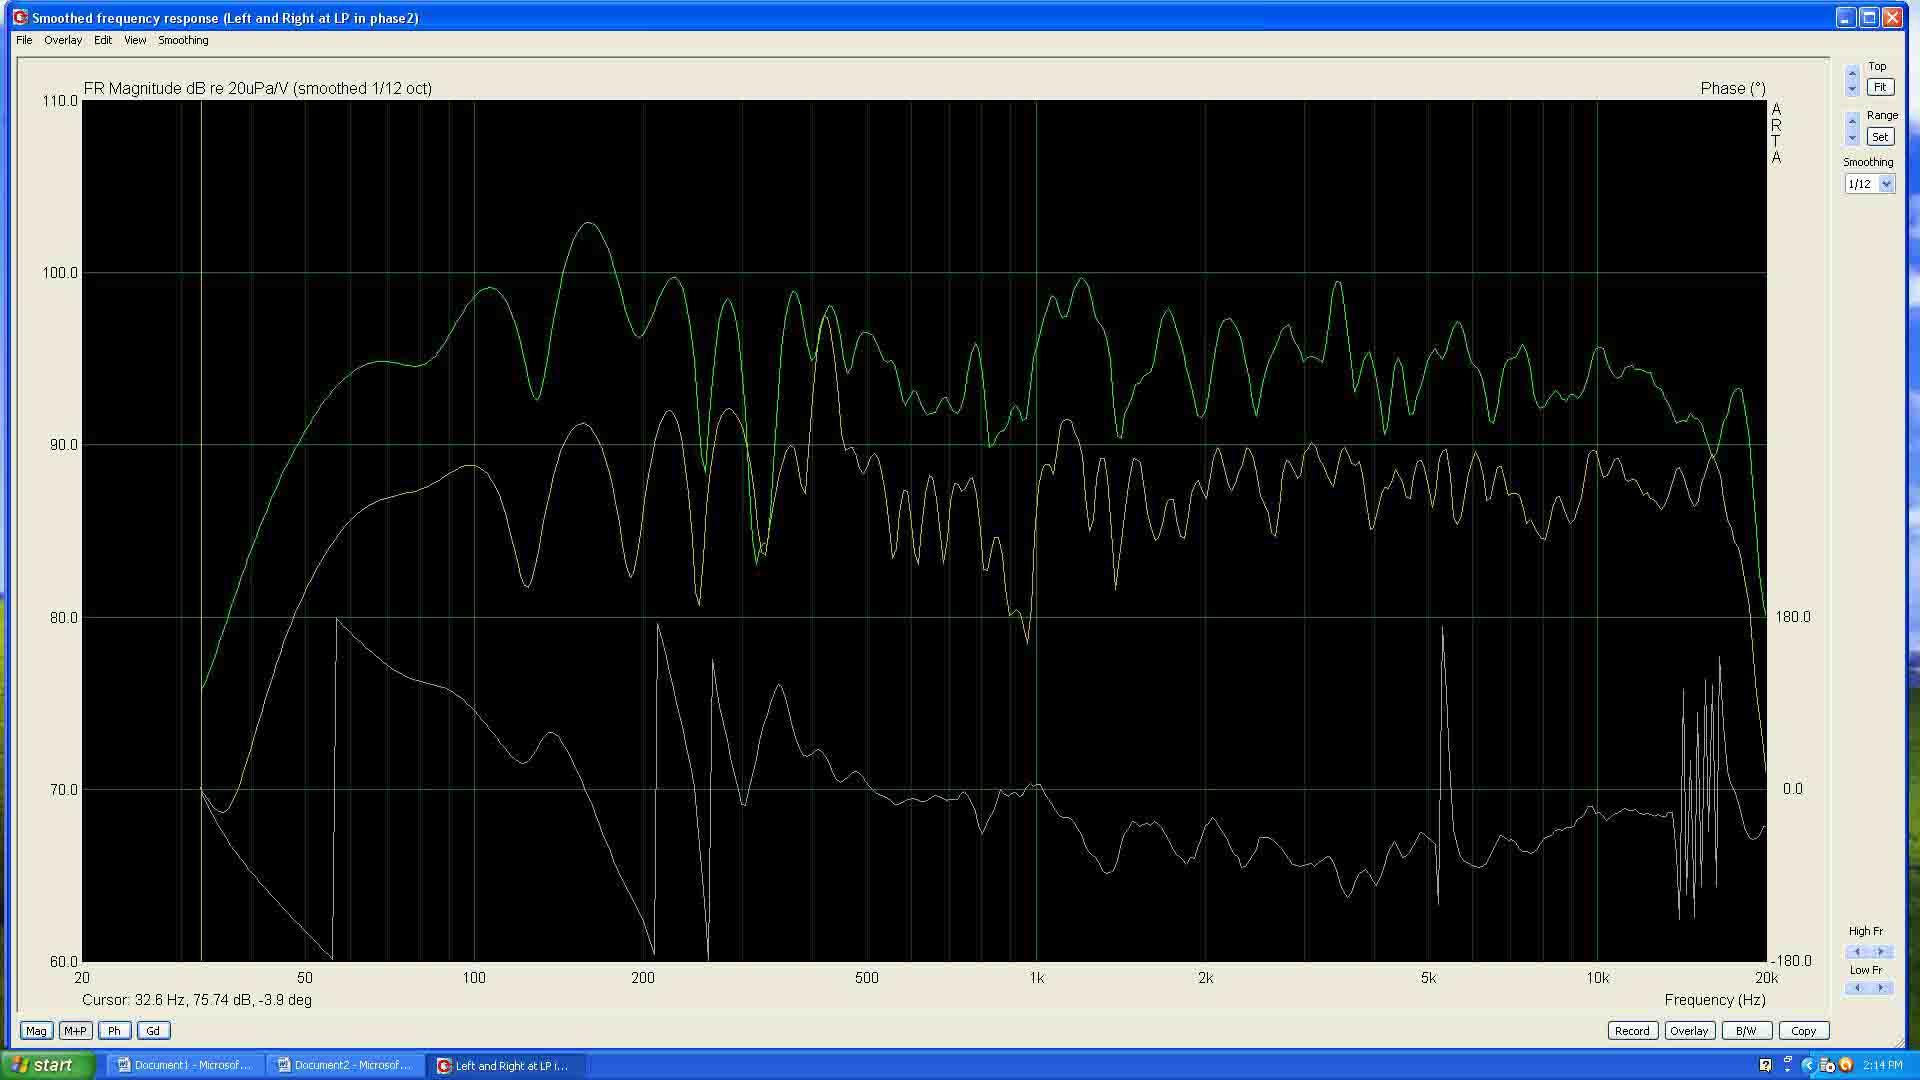 http://audioroundtable.com/misc/room_modes_response_08.jpg